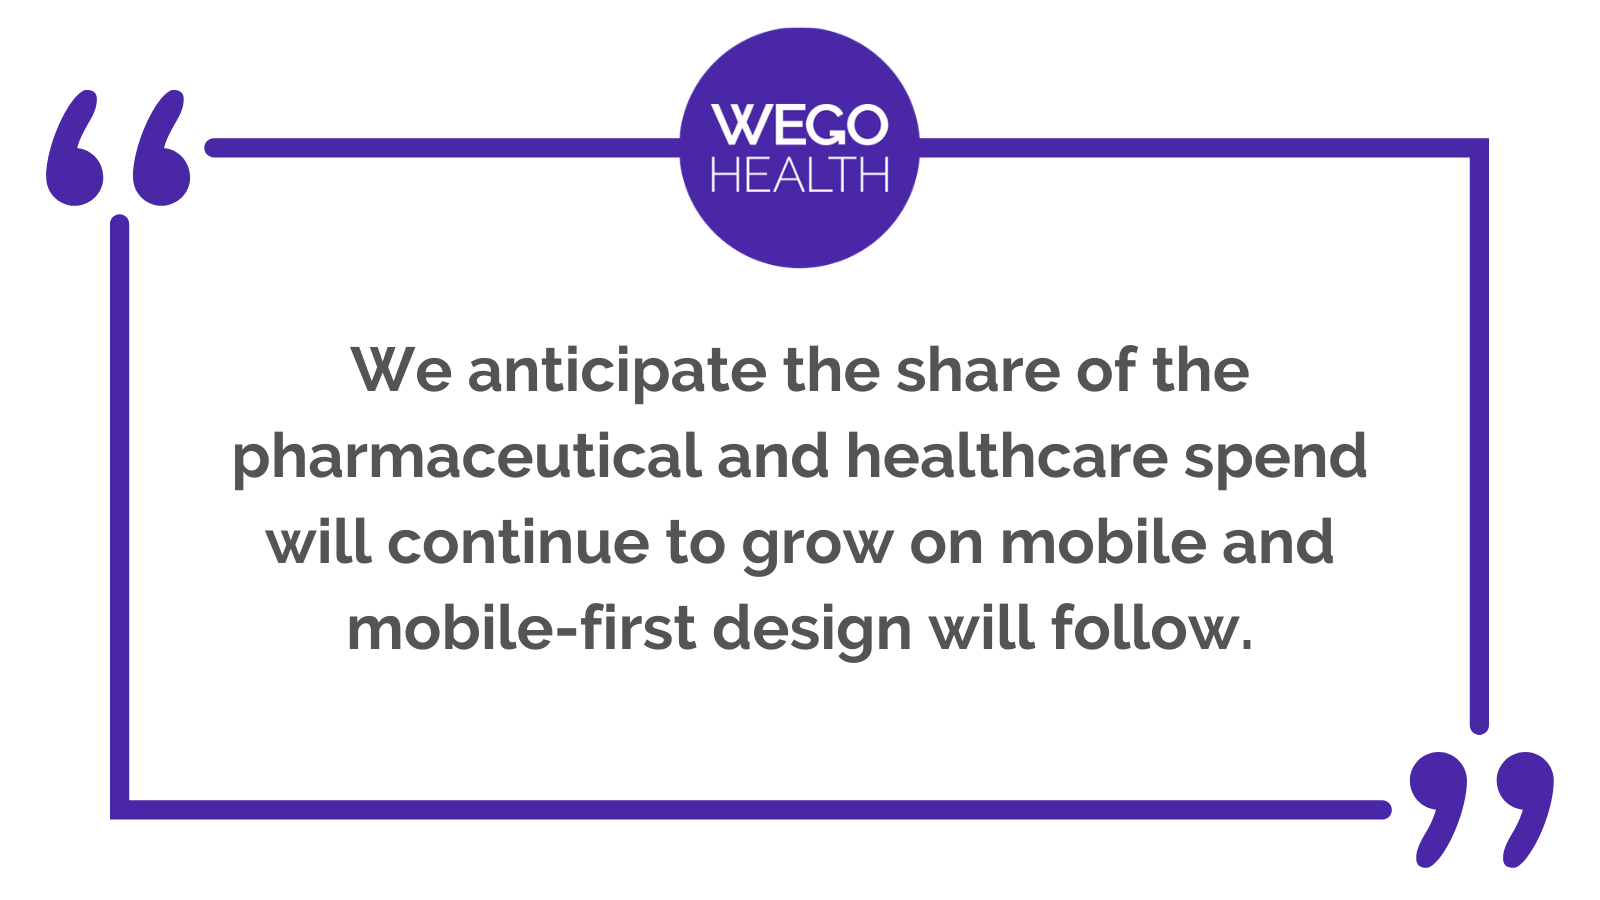 2021 Pharma DTC Marketing Trends WEGO Health